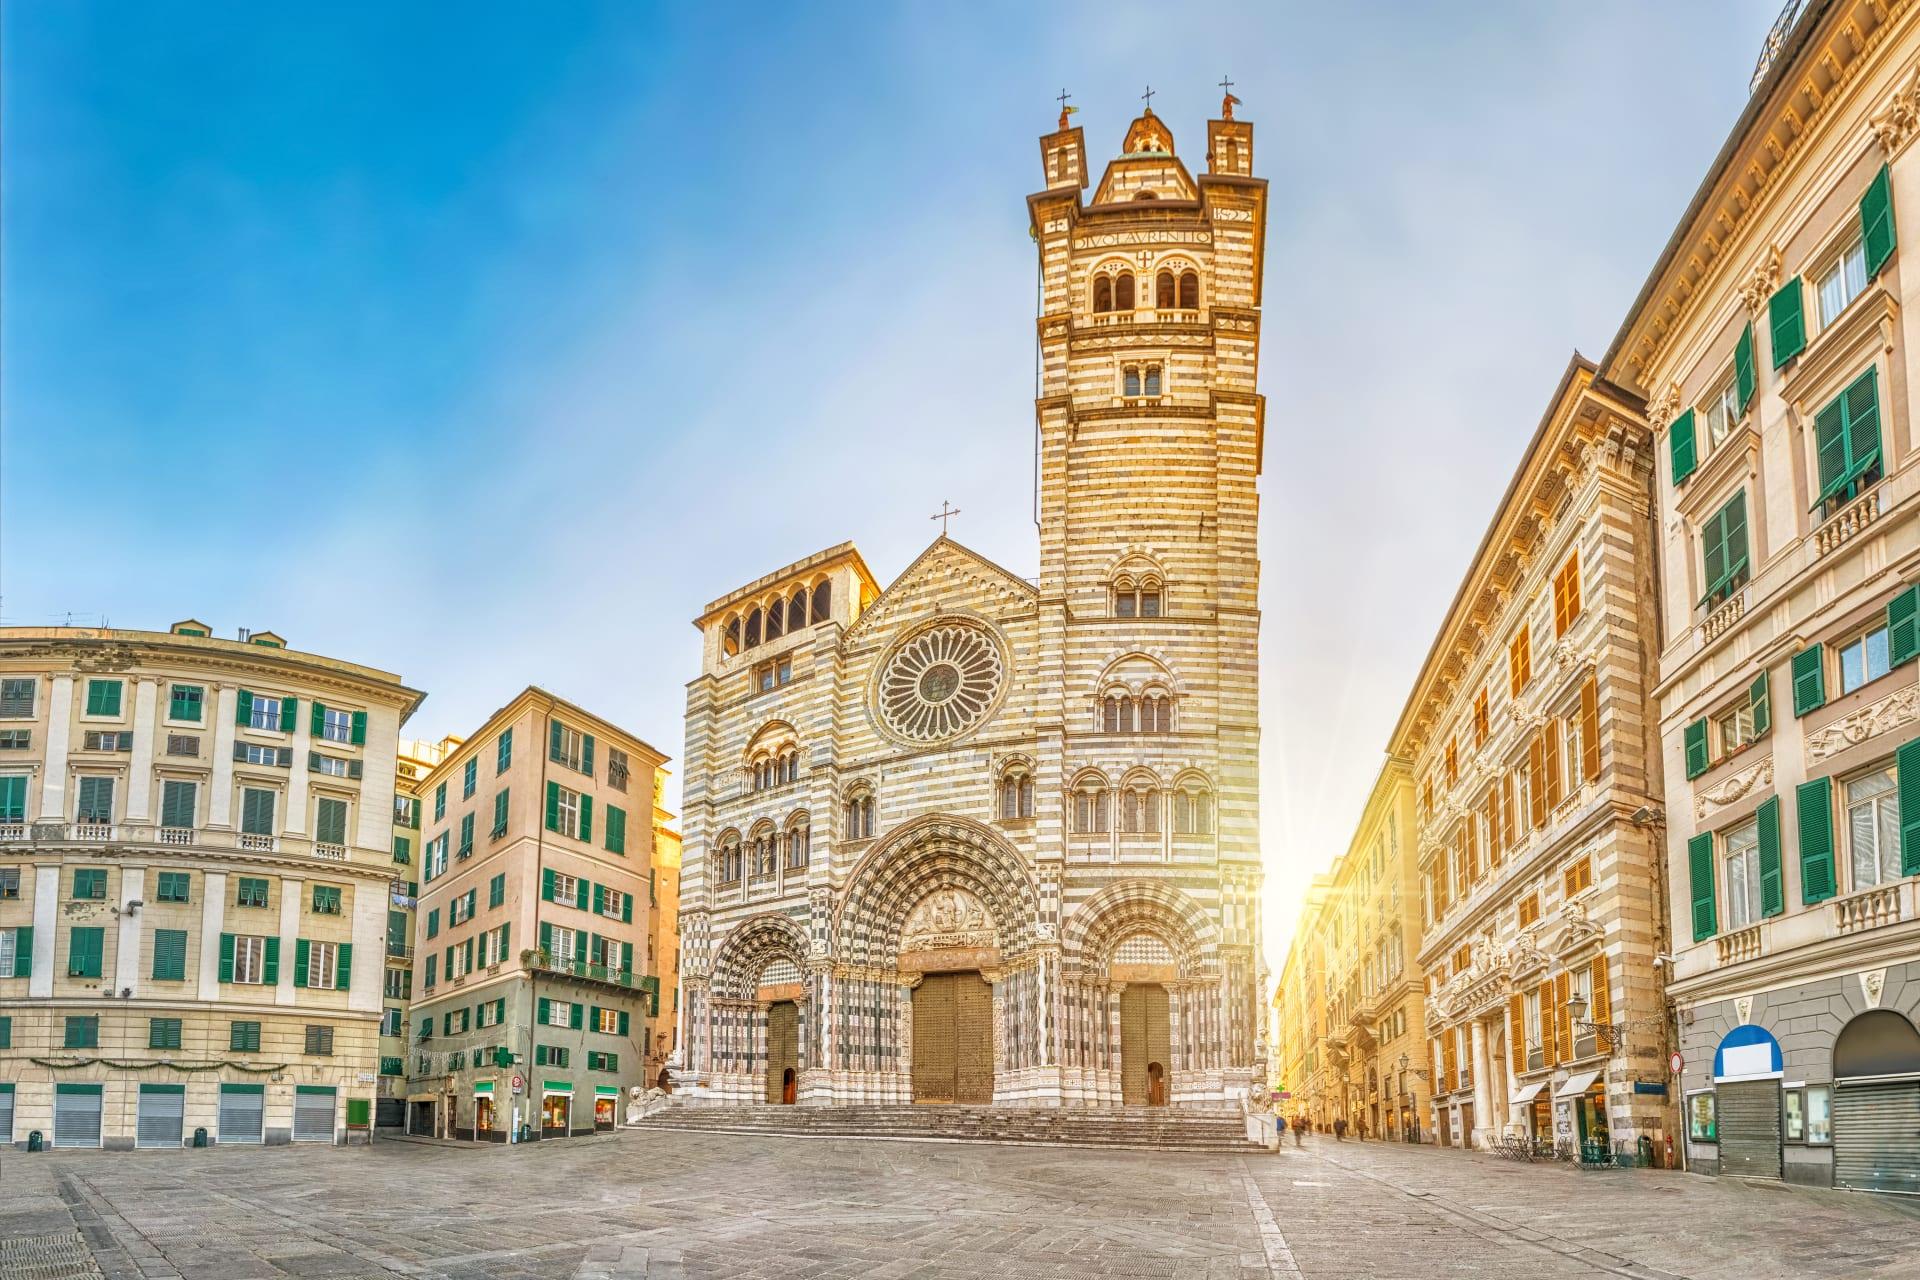 Piemonte - Alba: Northern Italian Capital of Taste